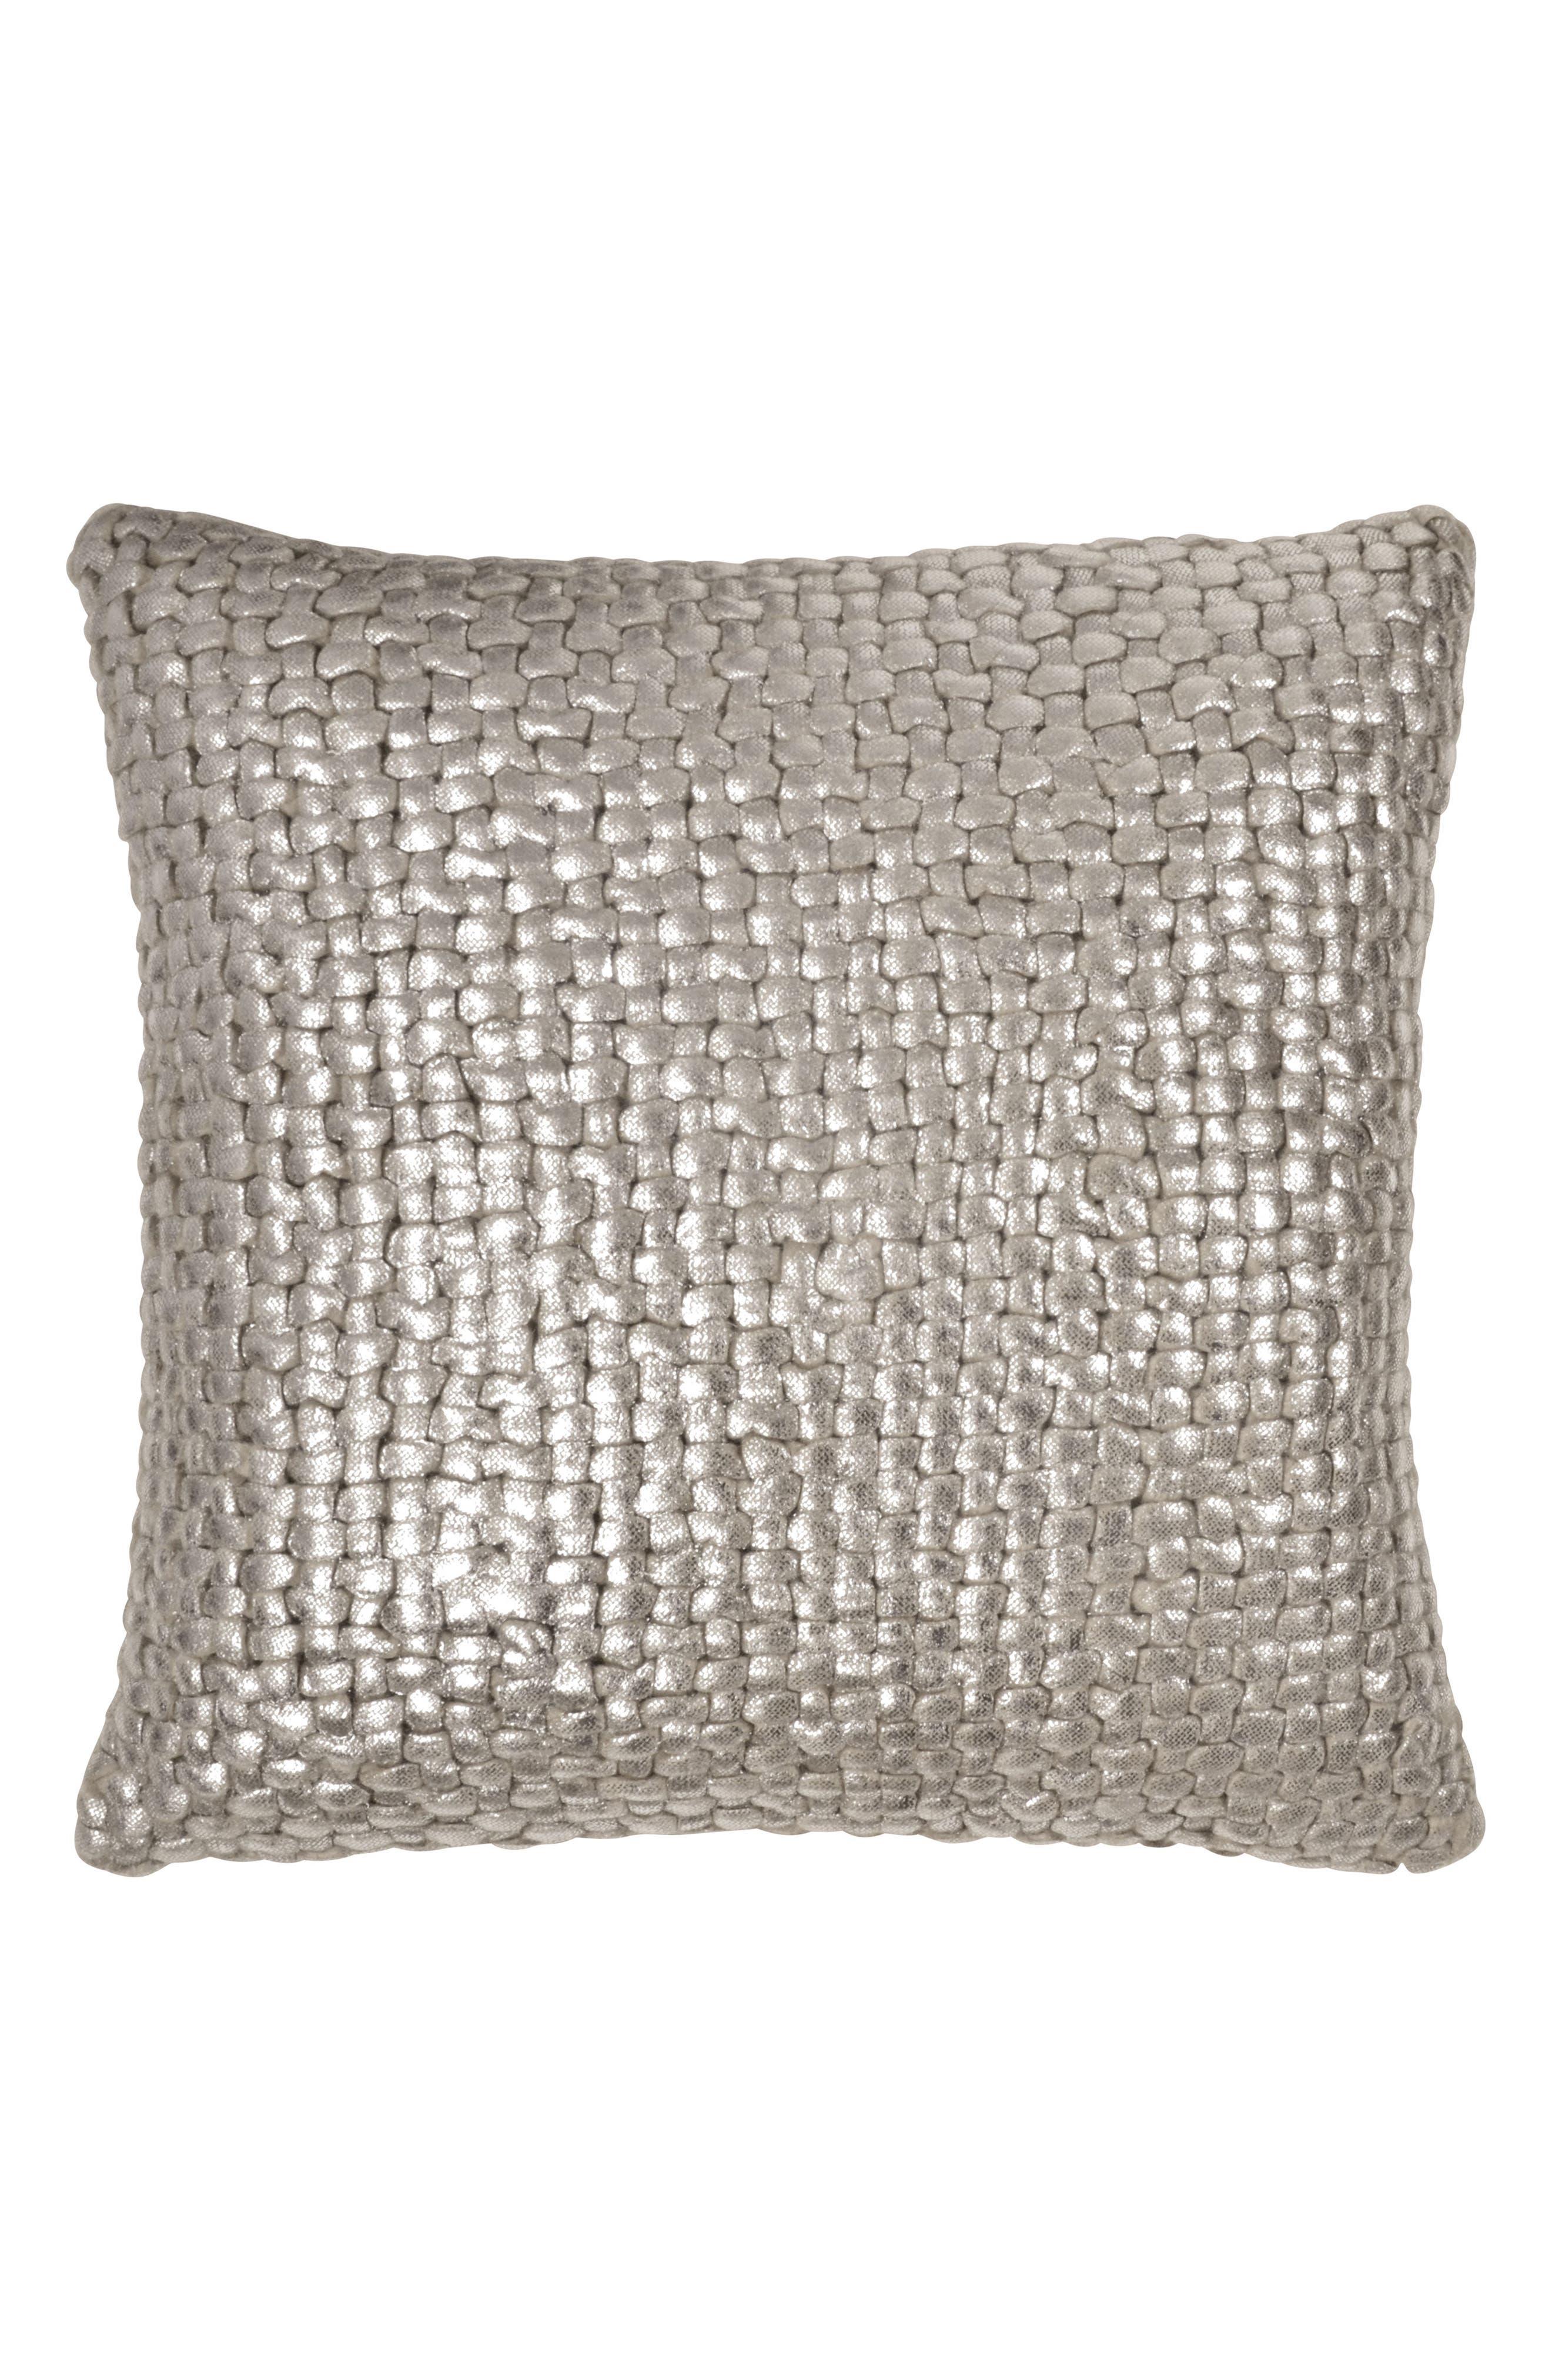 Michael Aram Metallic Basket Weave Accent Pillow